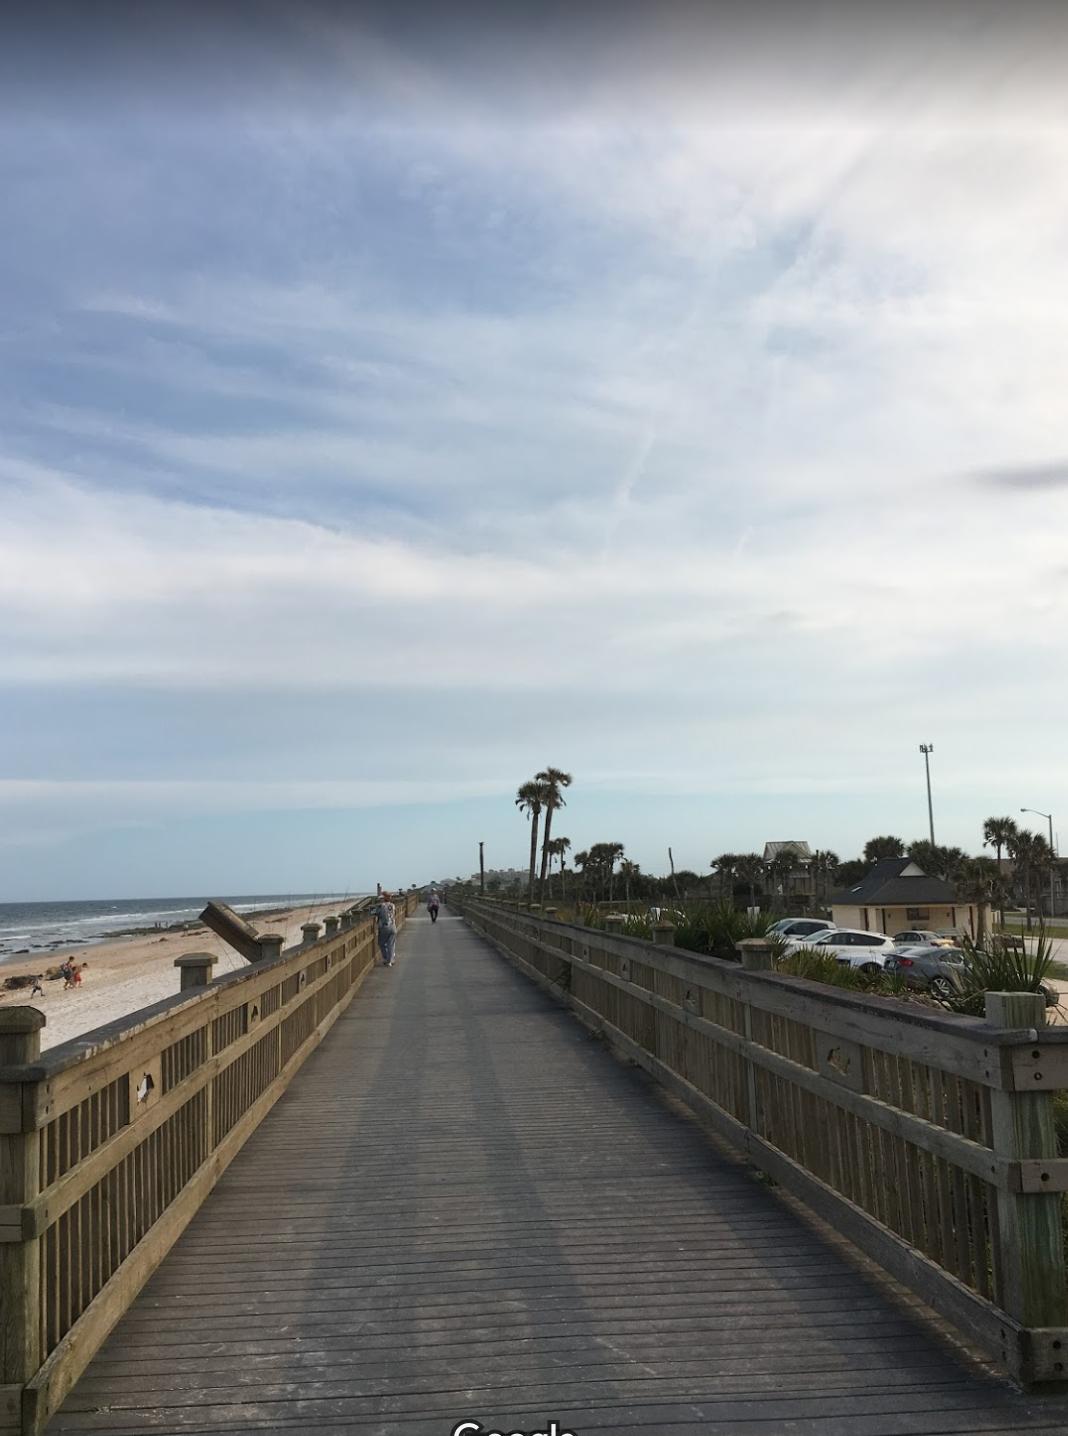 Boardwalk - meet me here!